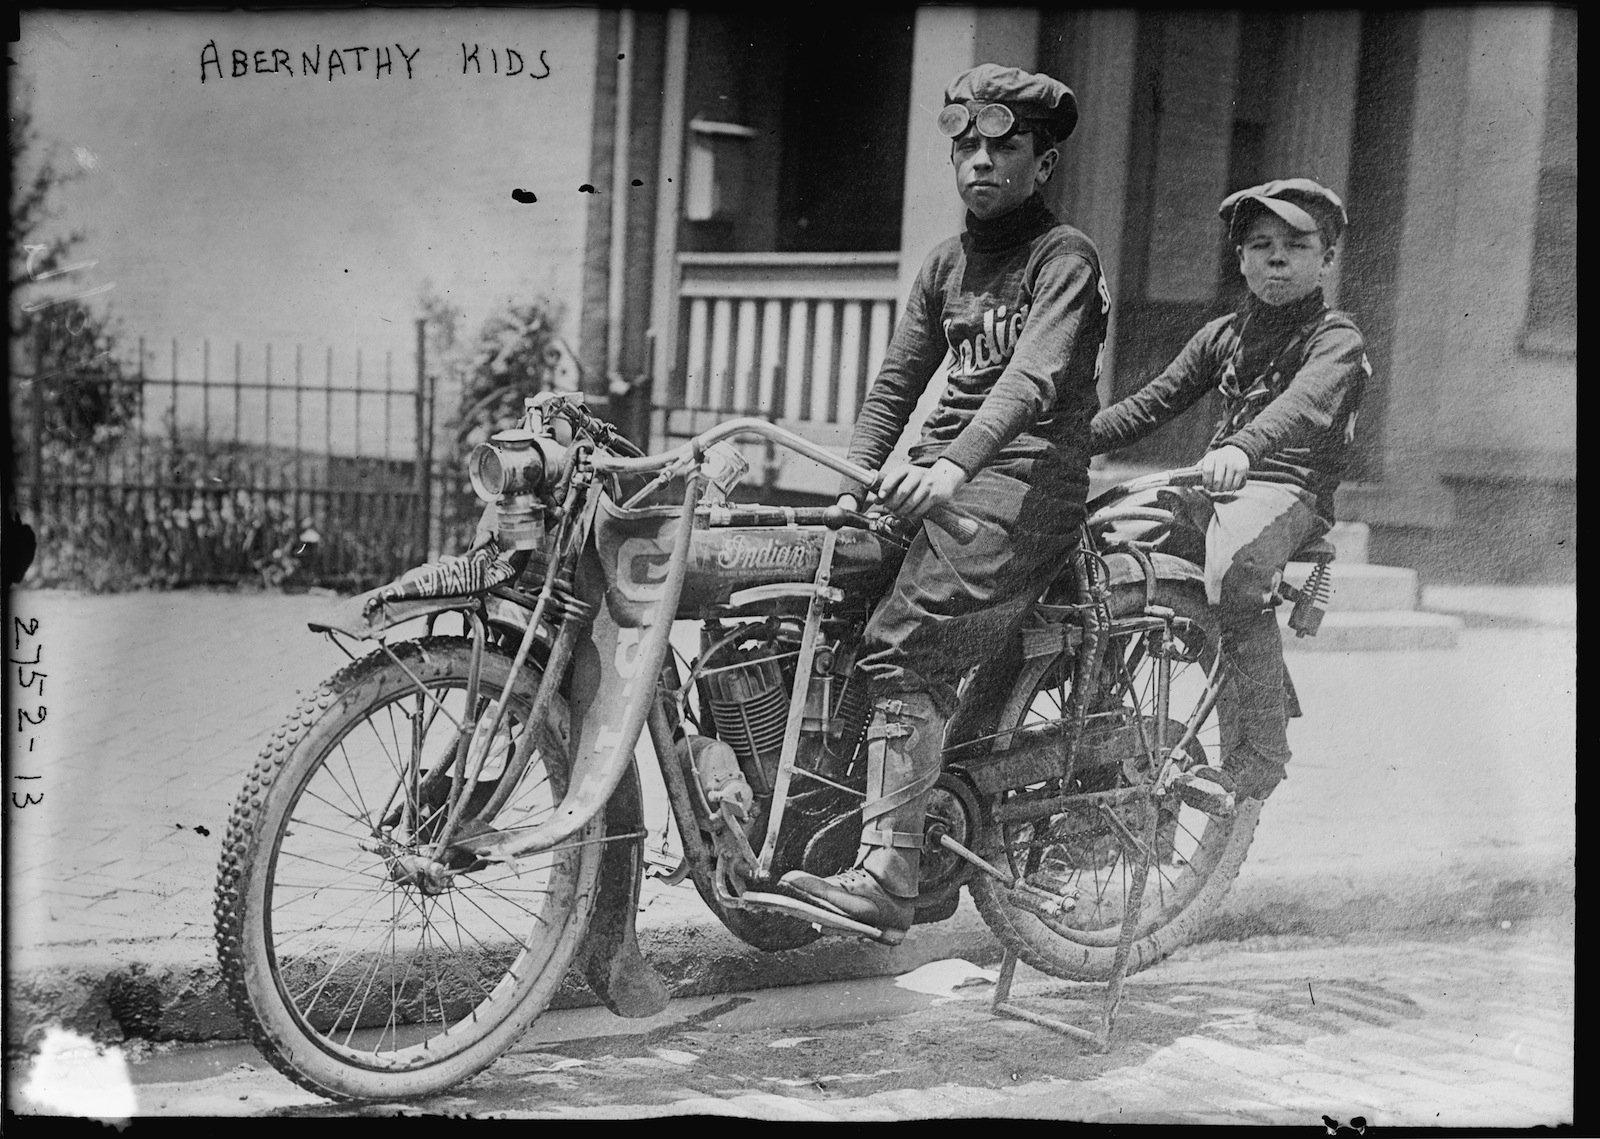 Abernathy Kids on Motorcycle Abernathy Kids on their Indian